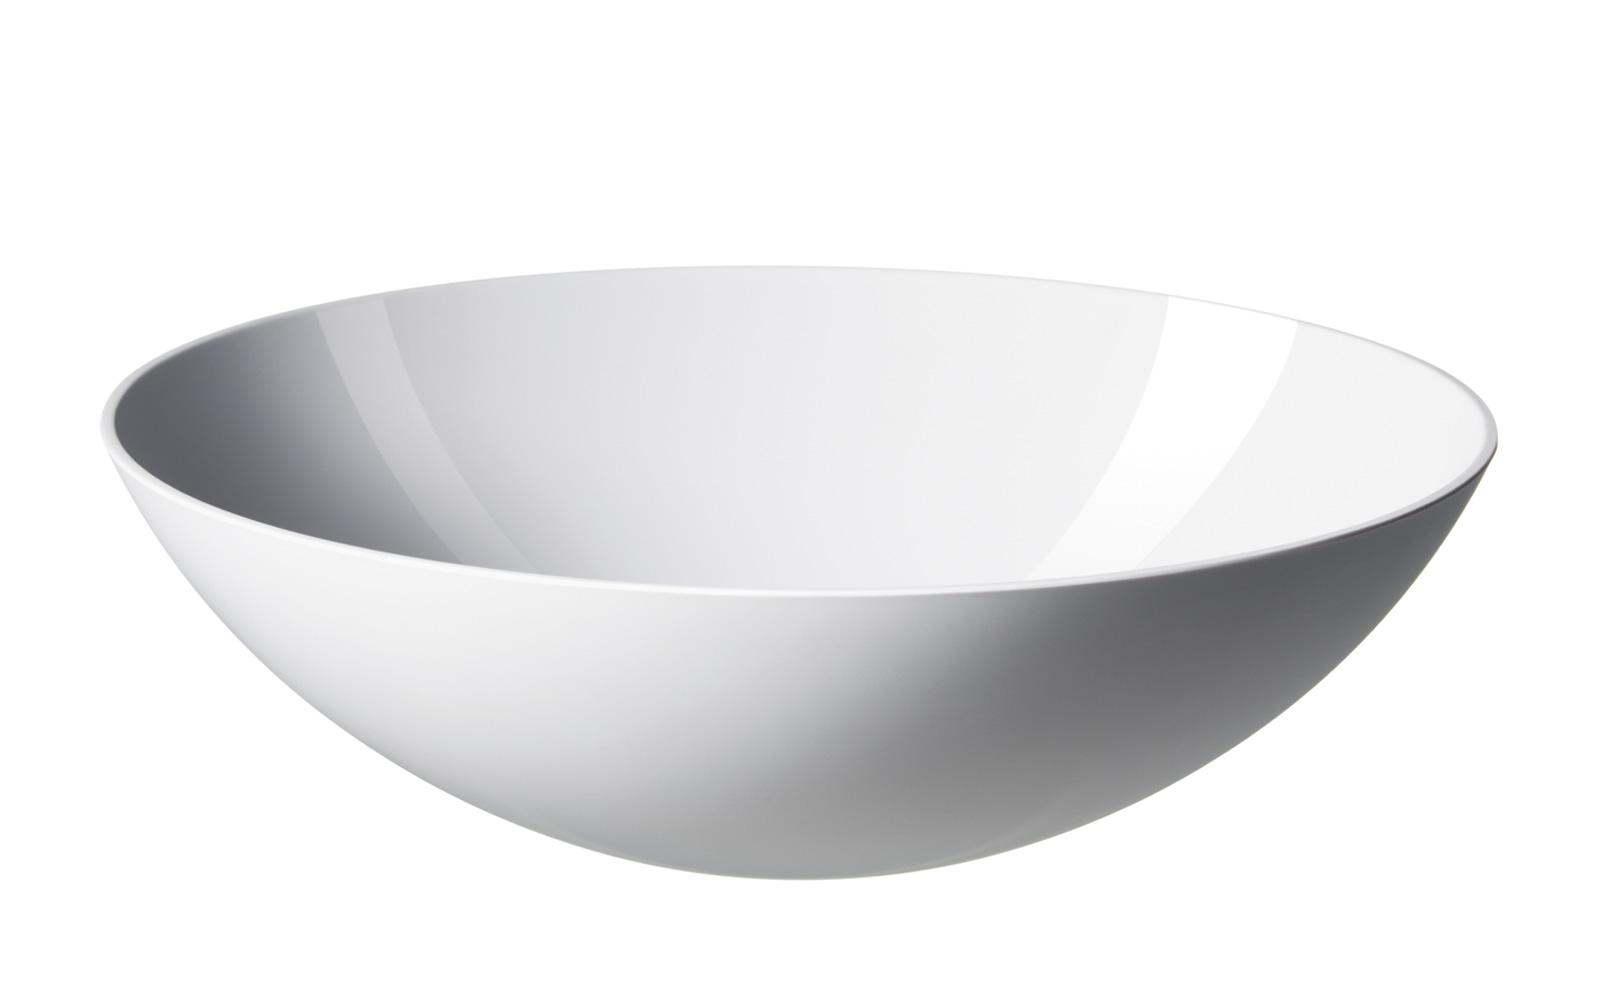 white krenit bowl Ø cm  a modern classic by normann copenhagen - undefined